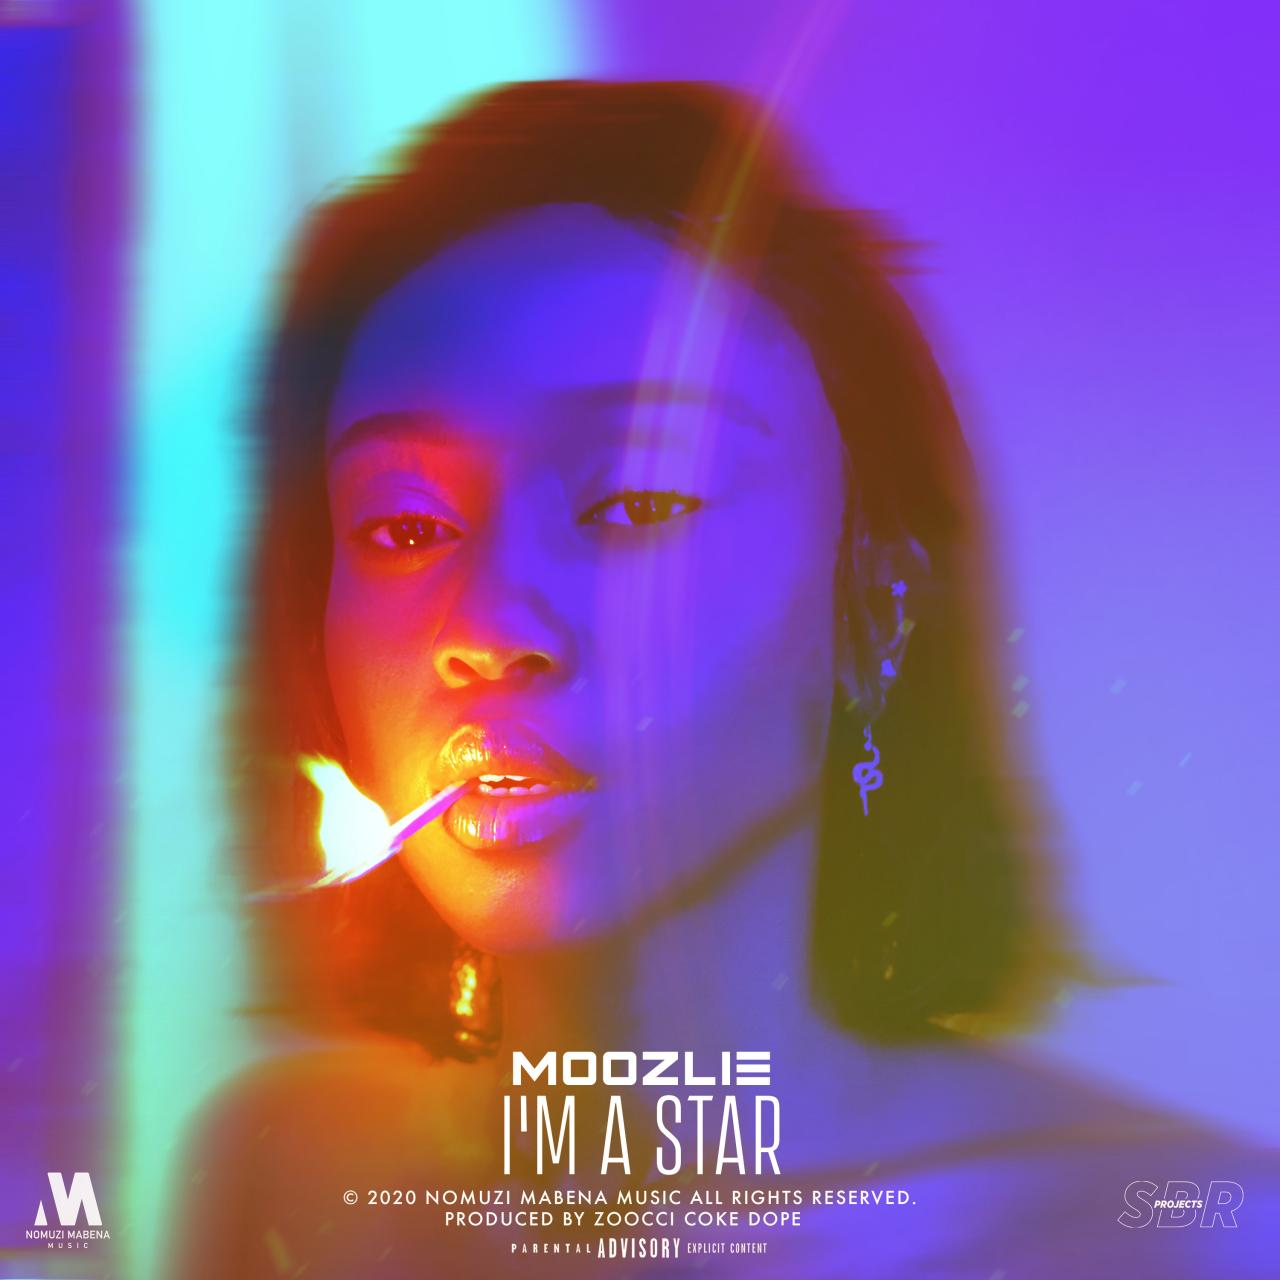 Moozlie - I am a Star - Produced by Zoocci Coke Dope